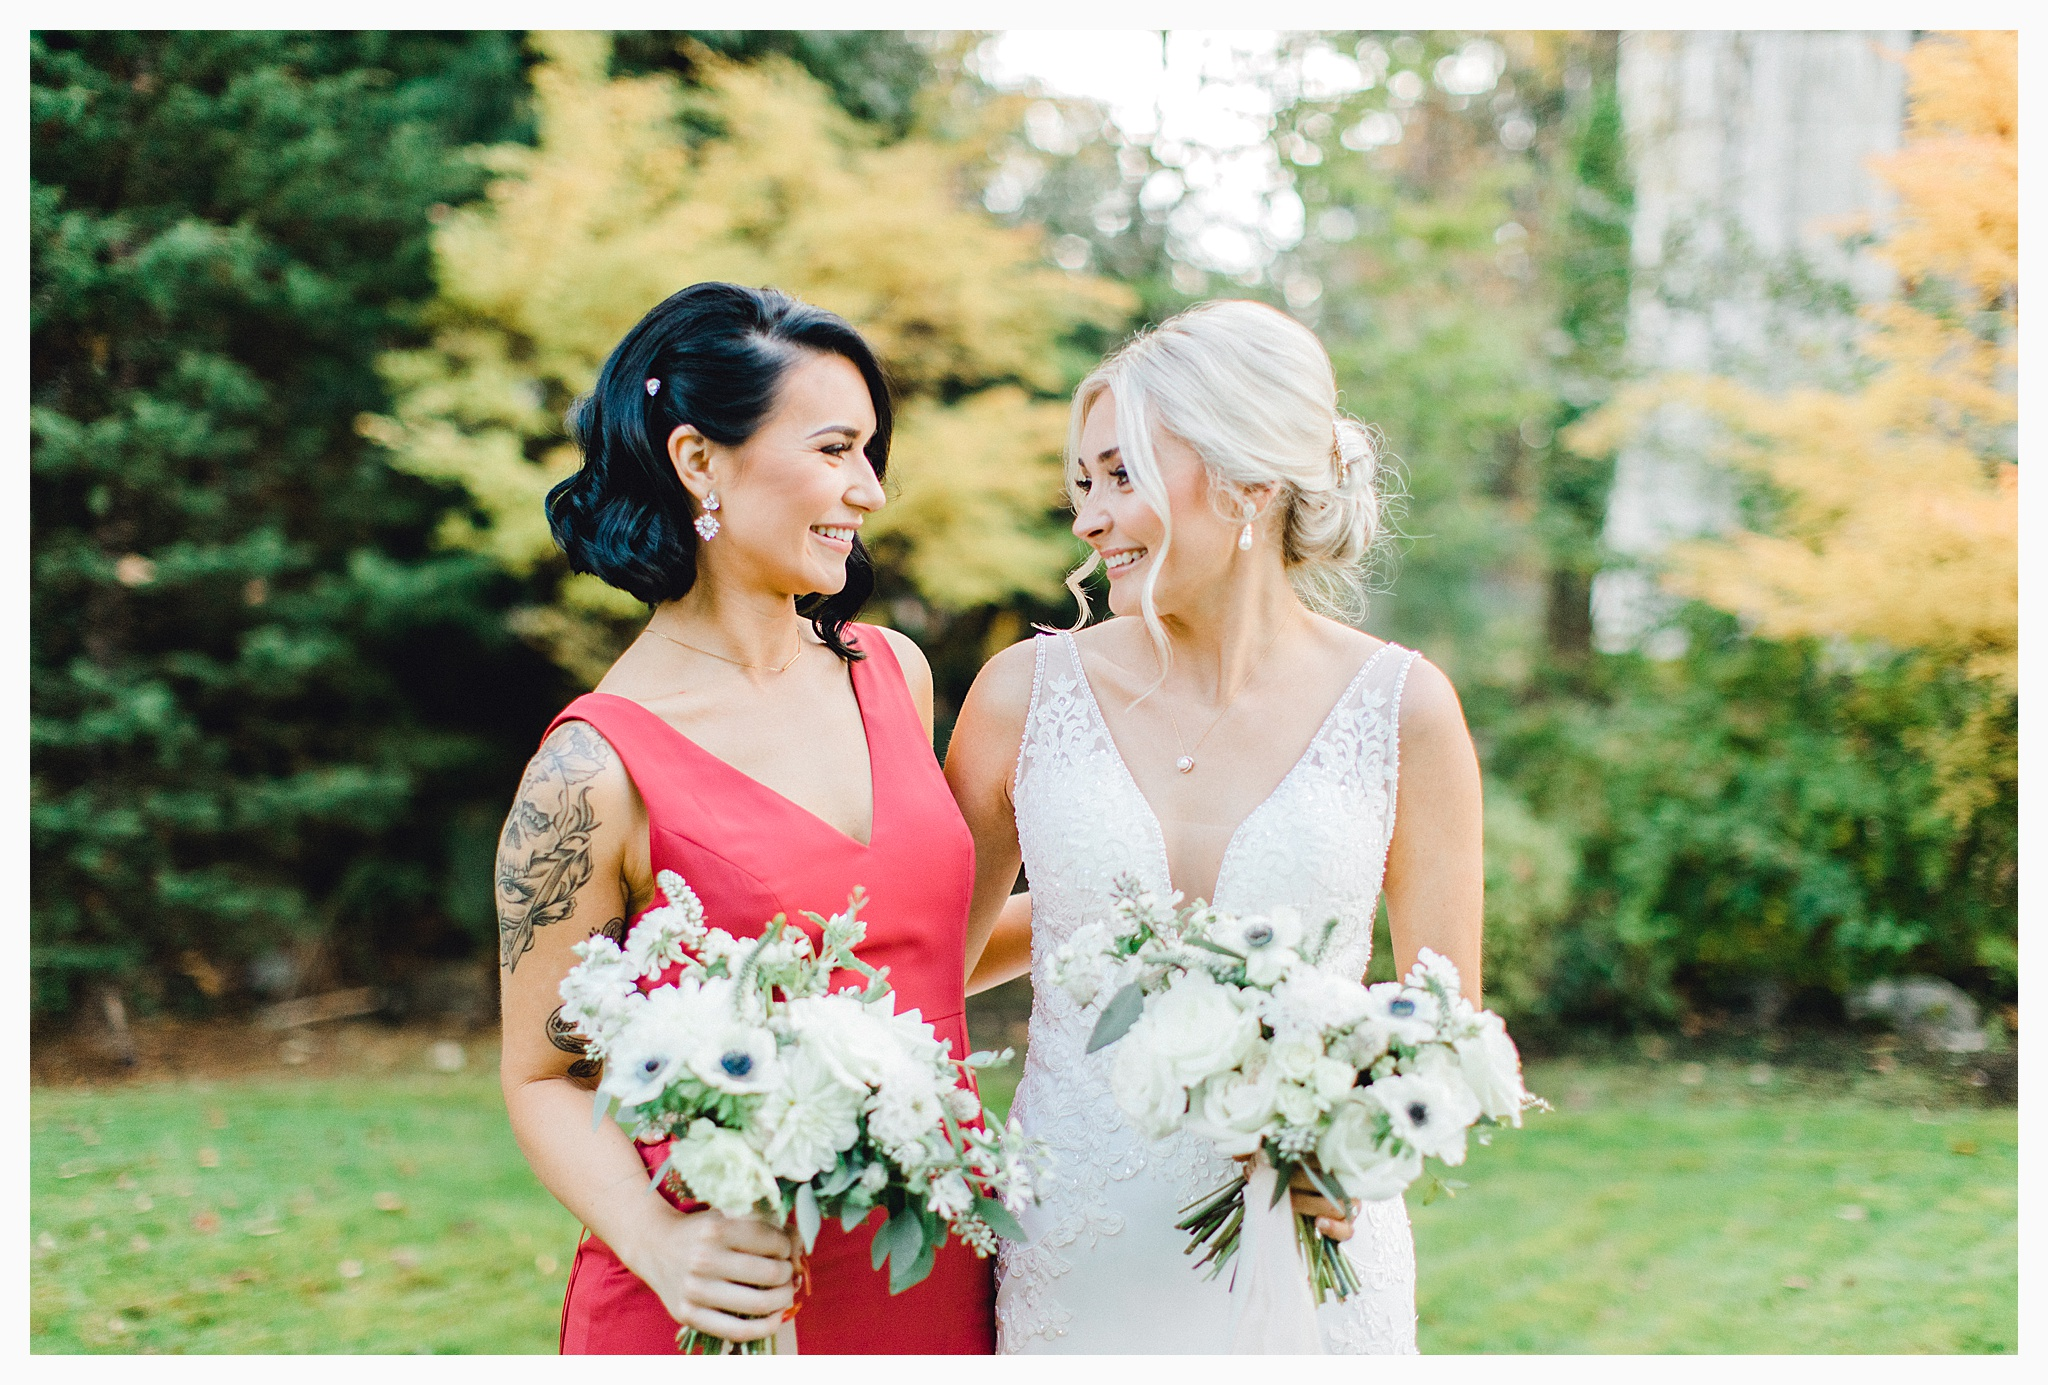 Emma Rose Company Light and Airy Wedding Photographer, Beautiful fall wedding at Rock Creek Gardens Venue in Puyallup, Washington._0044.jpg